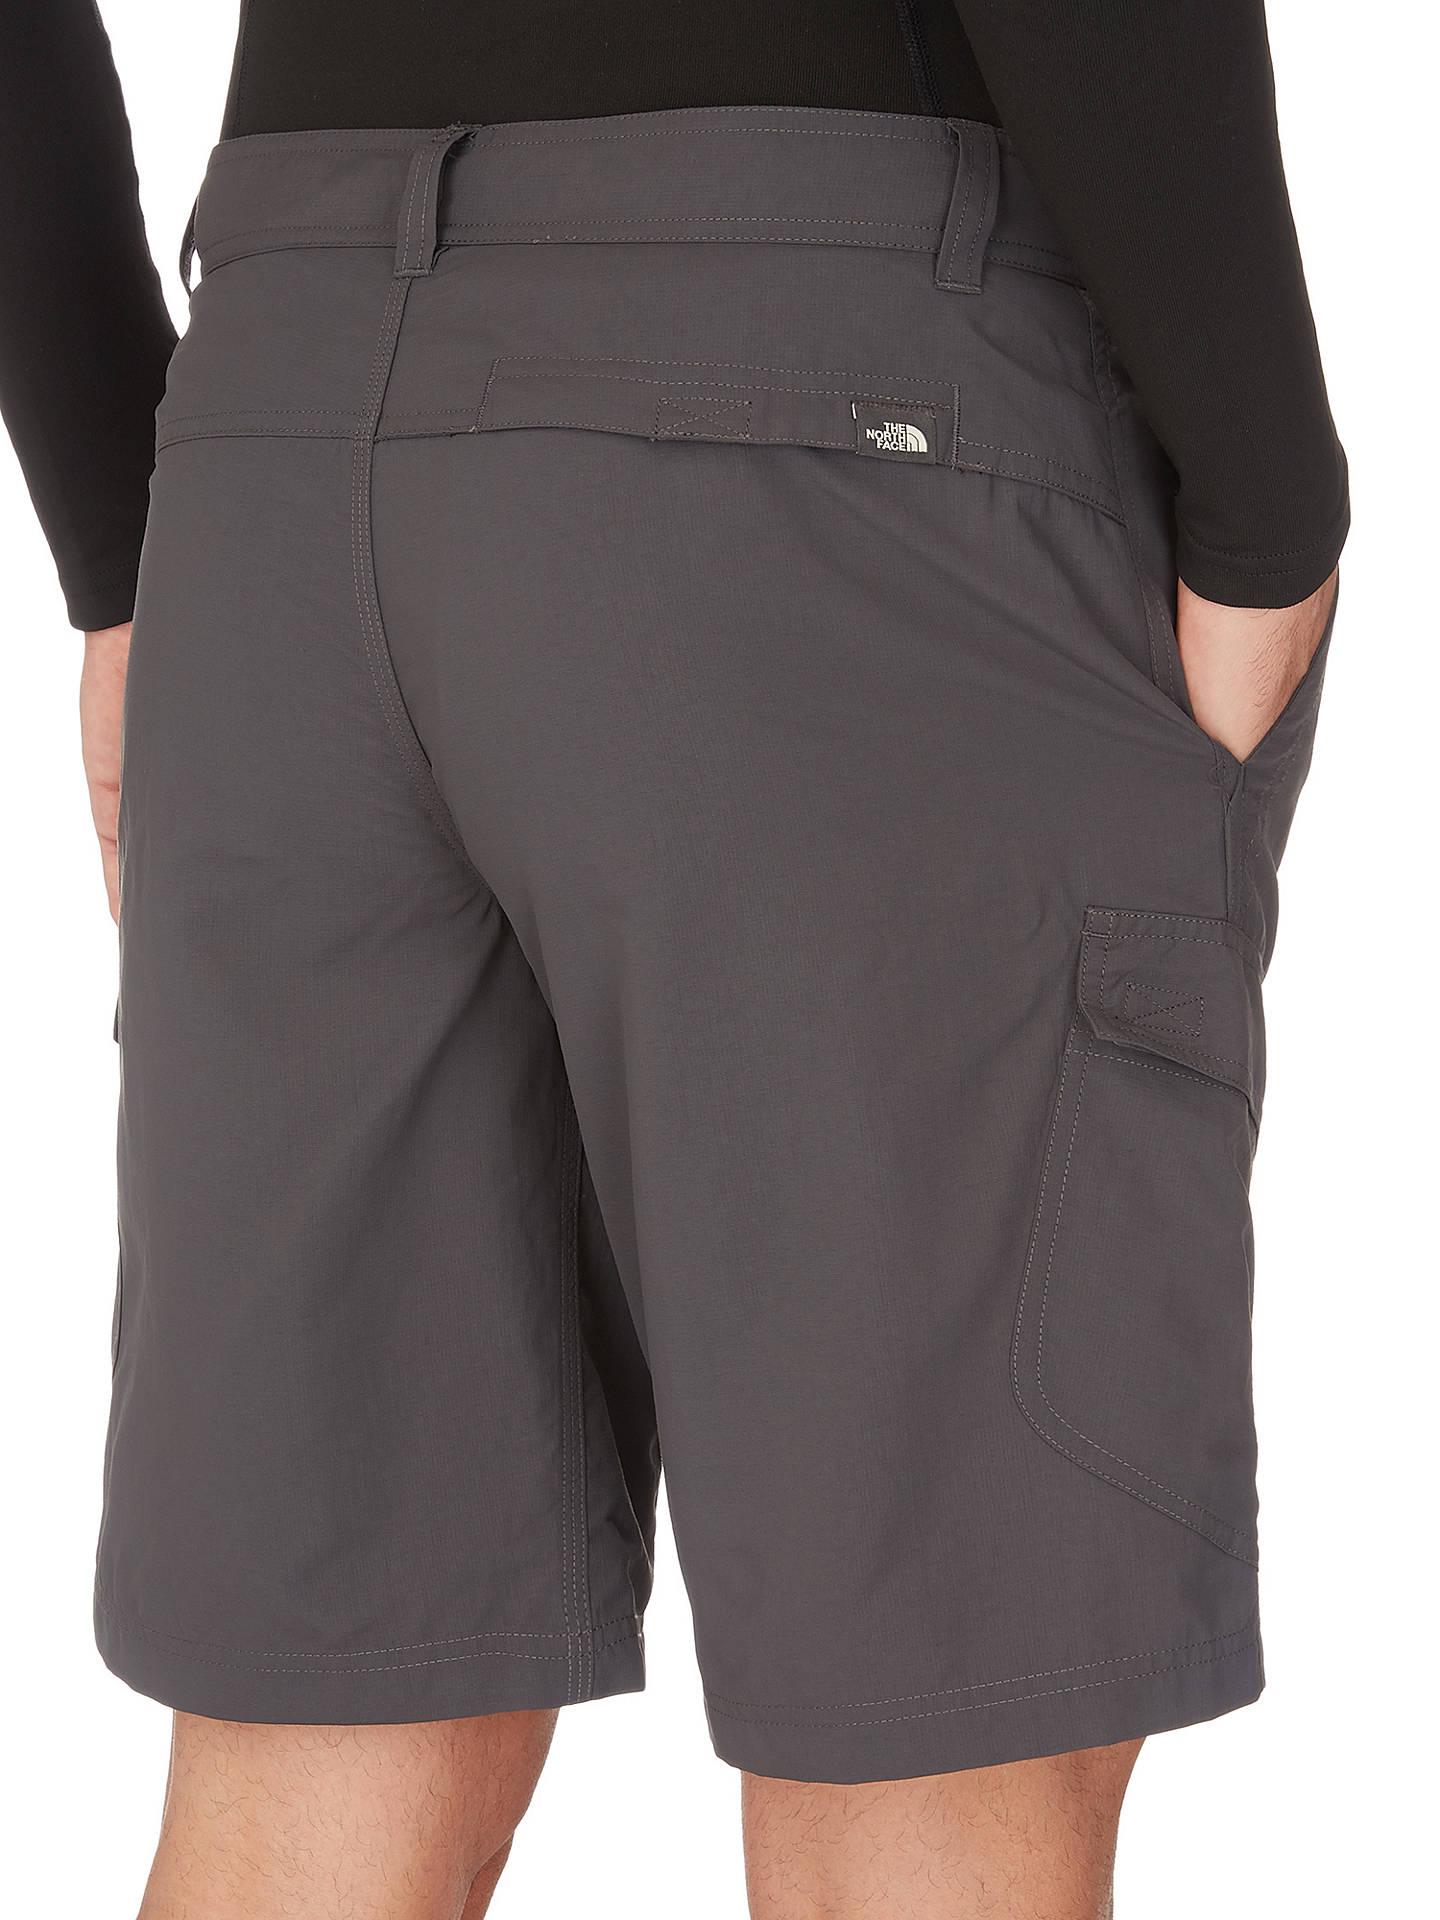 81ff03d520 Buy The North Face Horizon Cargo Shorts, Asphalt Grey, S Online at  johnlewis.